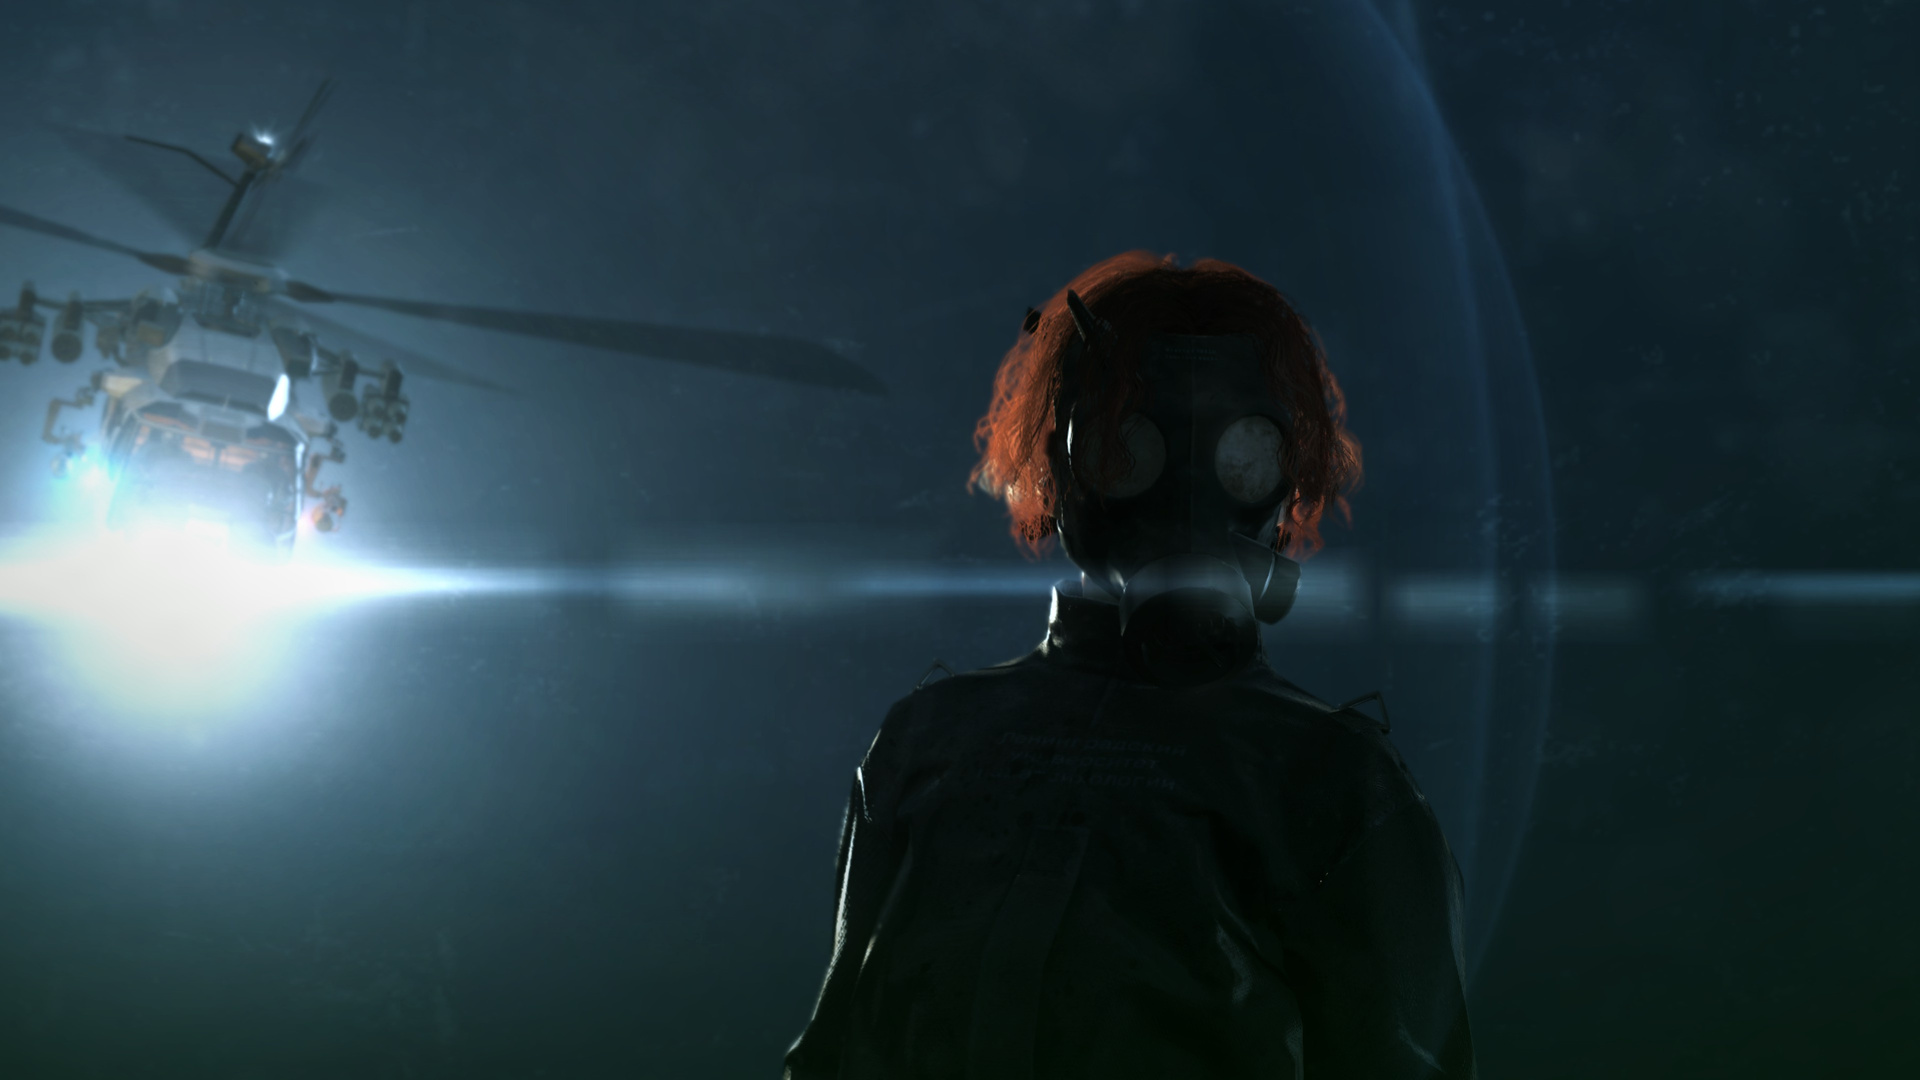 загруженное (14).jpg - Metal Gear Solid 5: The Phantom Pain